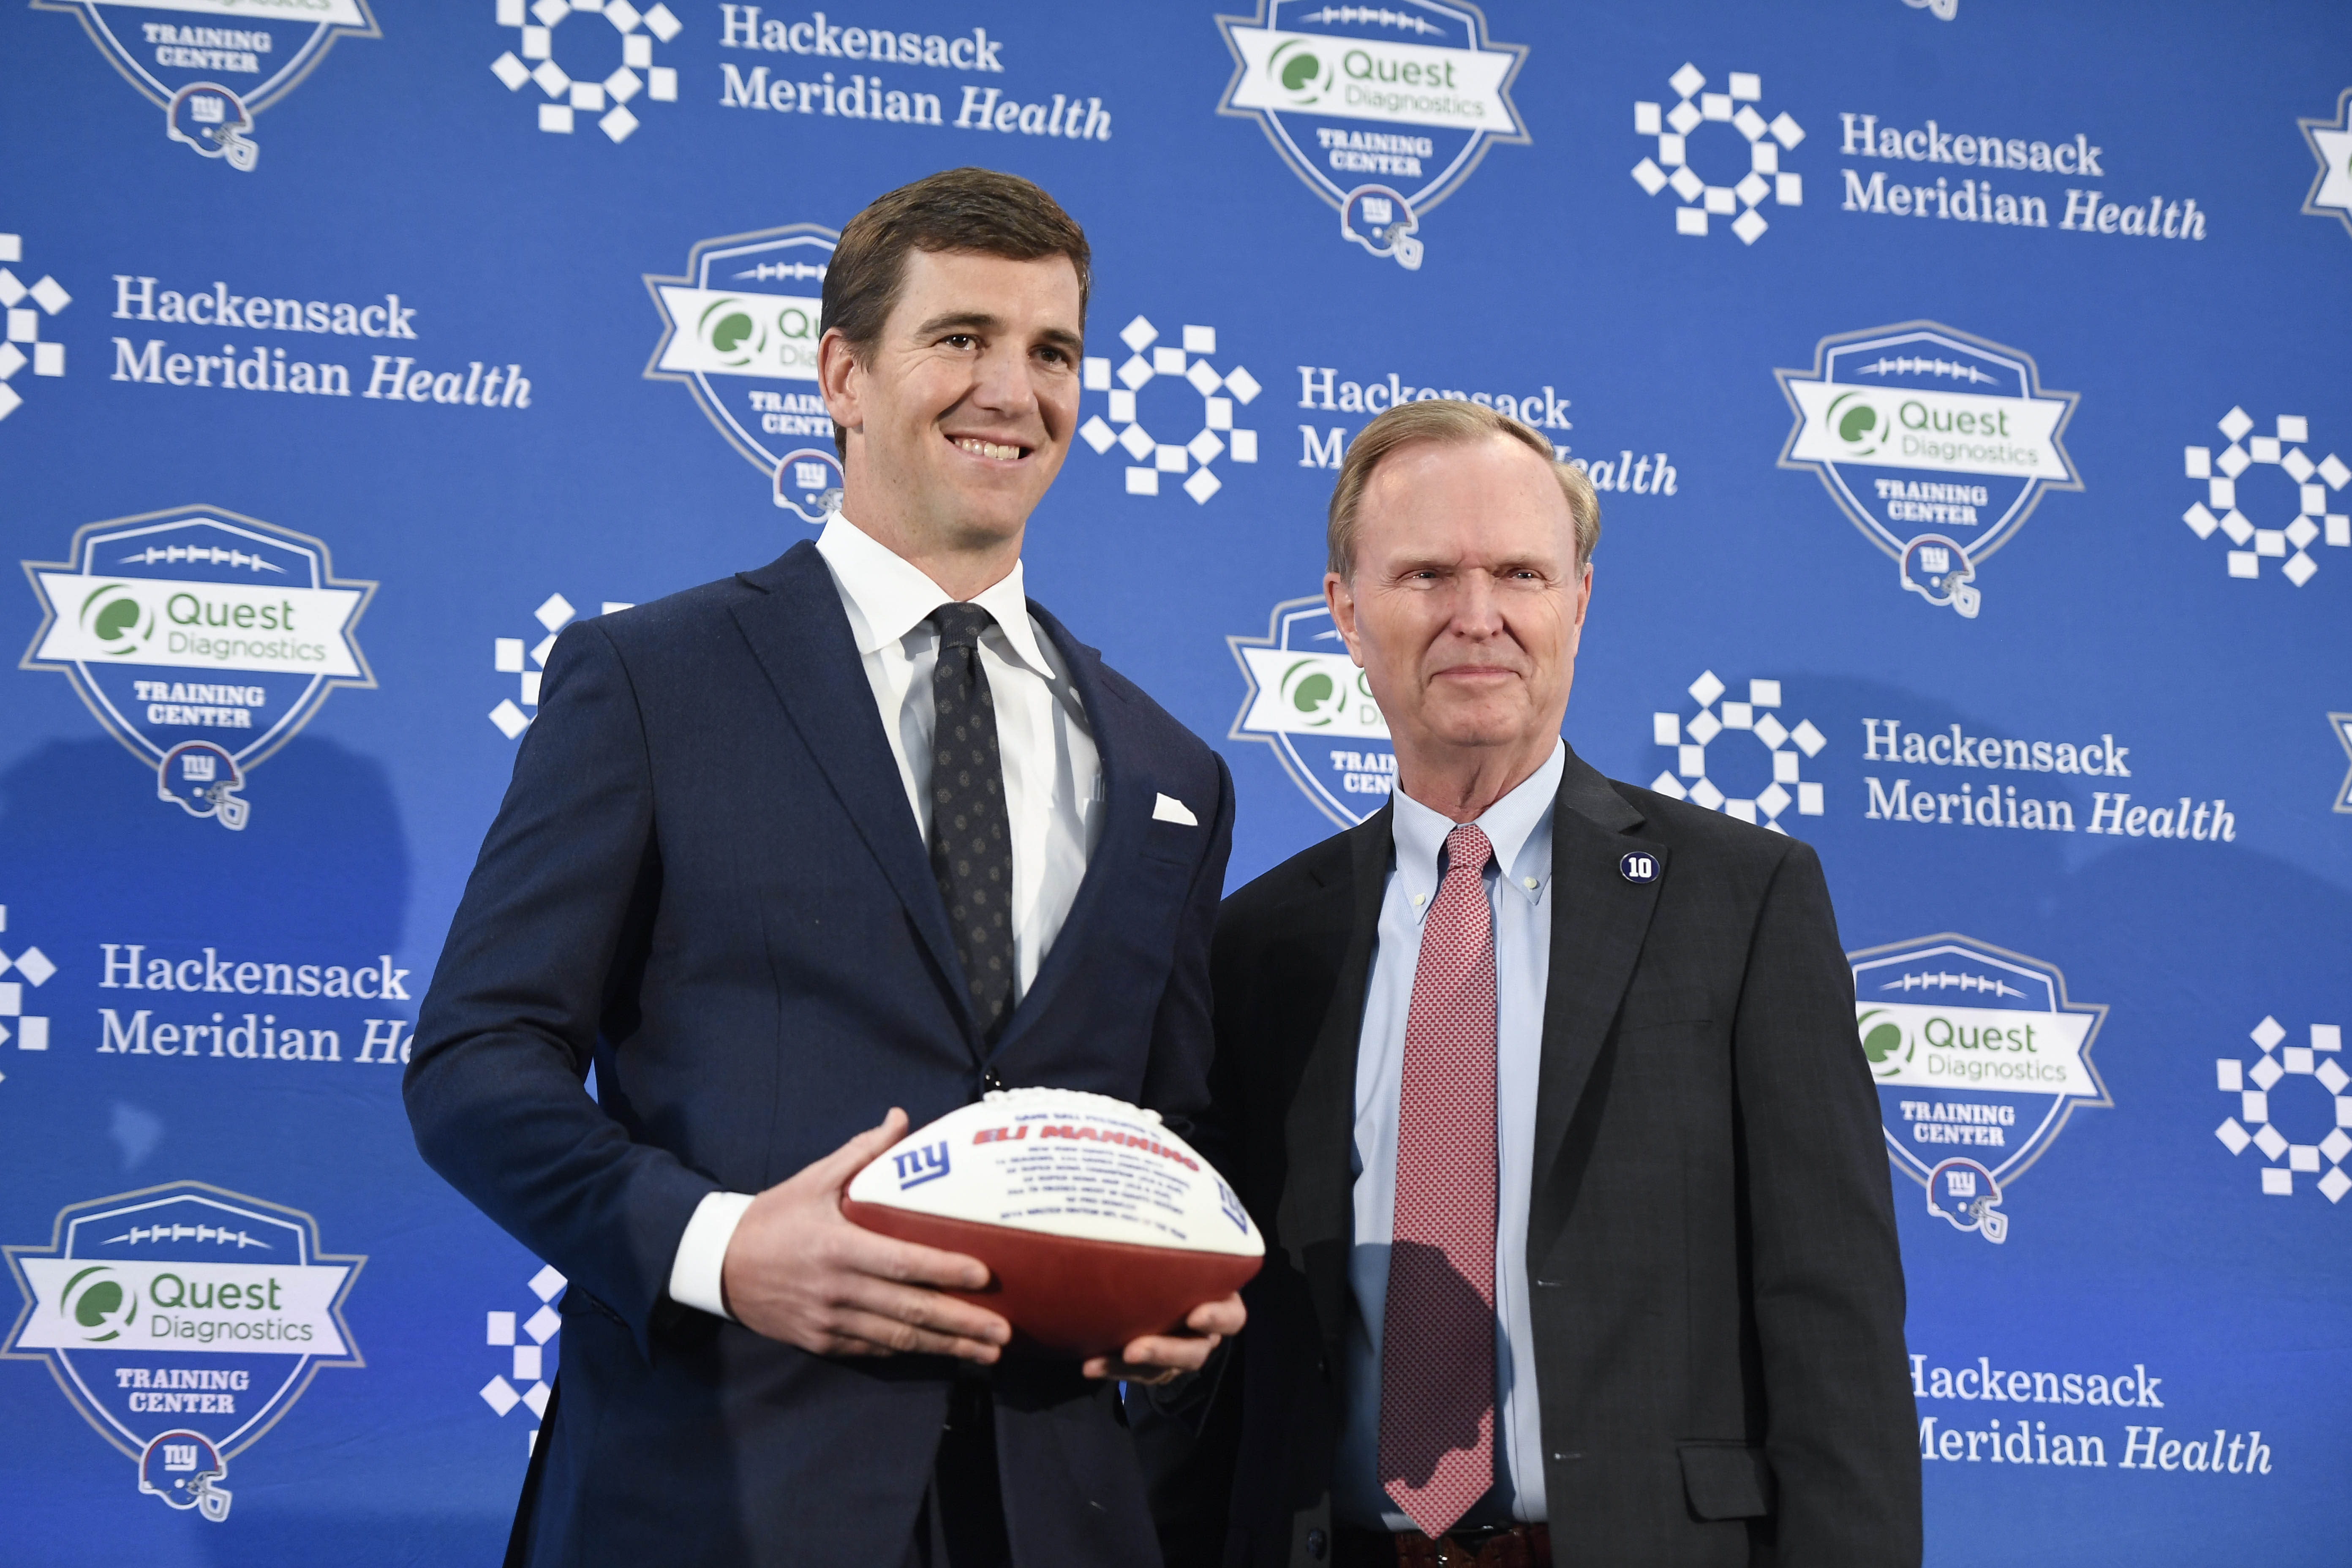 NFL: New York Giants-Eli Manning Retirement Press Conference